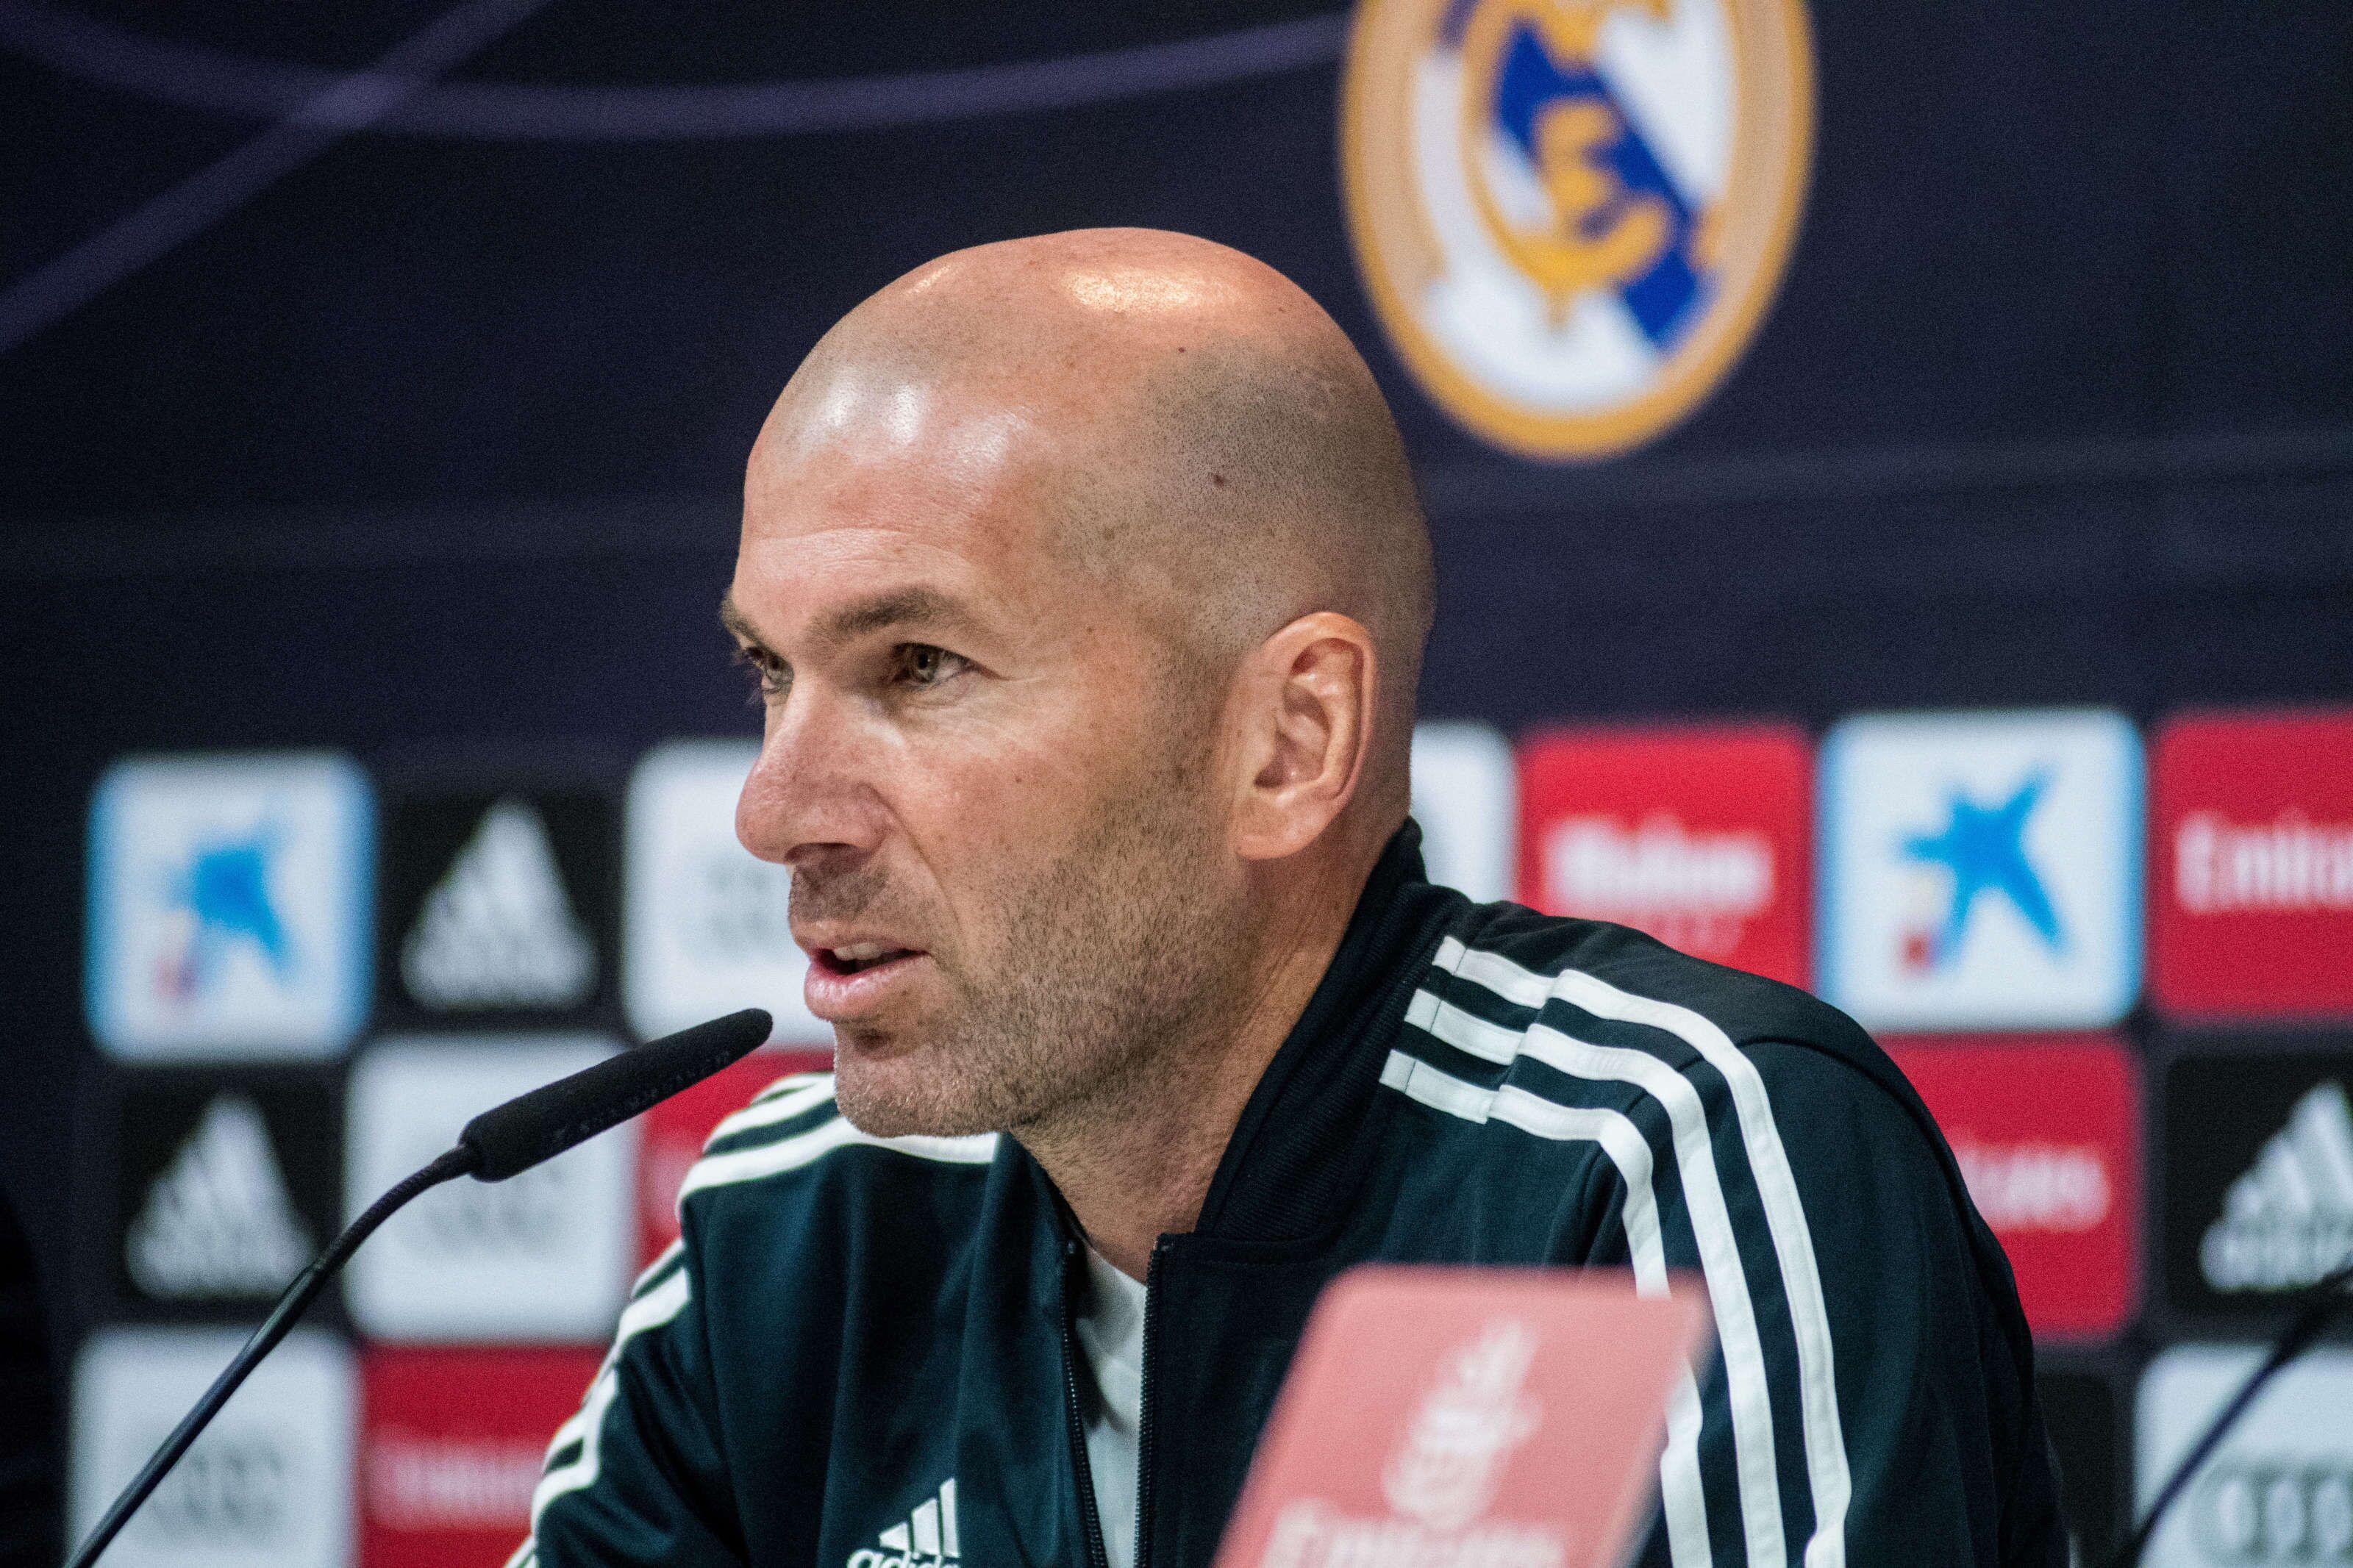 Real Madrid: Zinedine Zidane makes a smart decision on Kylian Mbappe